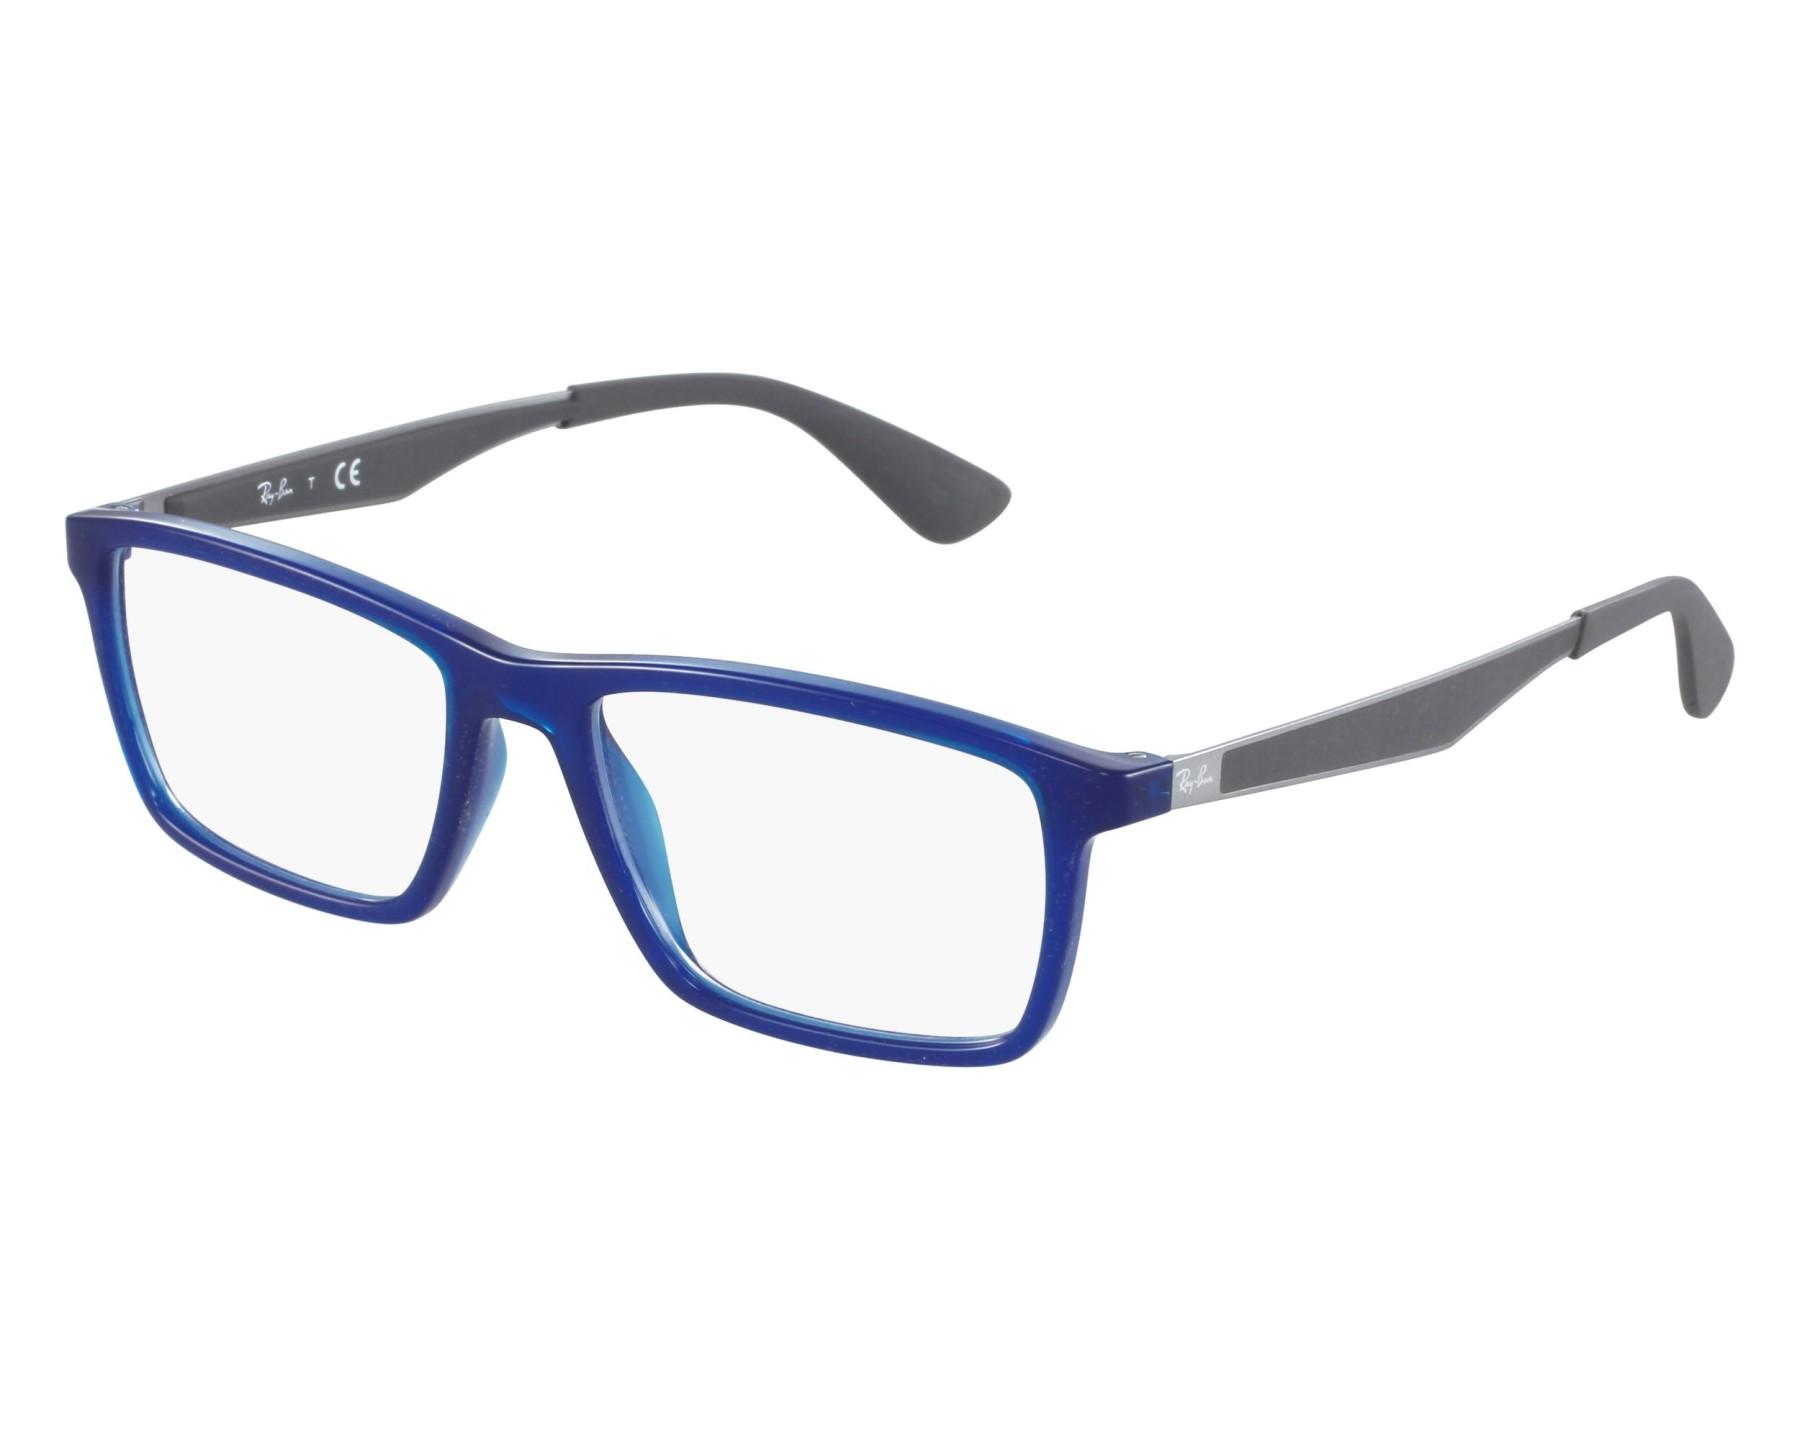 6abbc7b5ac eyeglasses Ray-Ban RX-7056 5393 55-17 Blue Grey front view